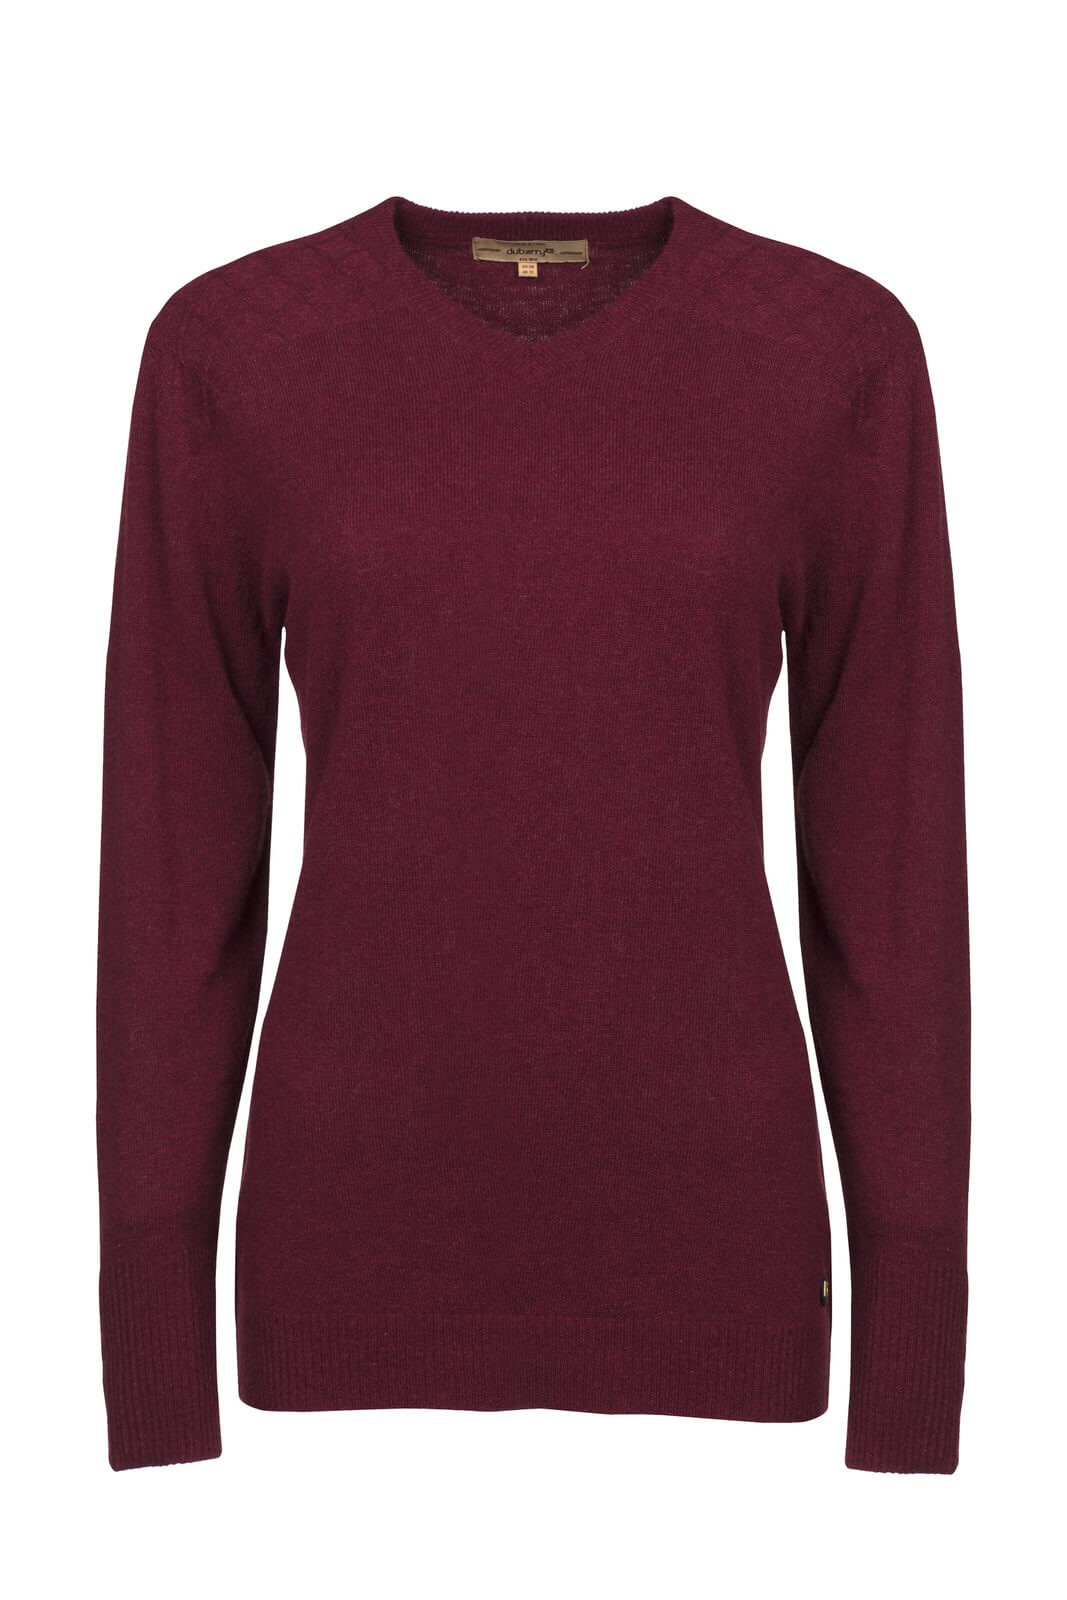 Dubarry_ Blackwater Sweater - Malbec_Image_2